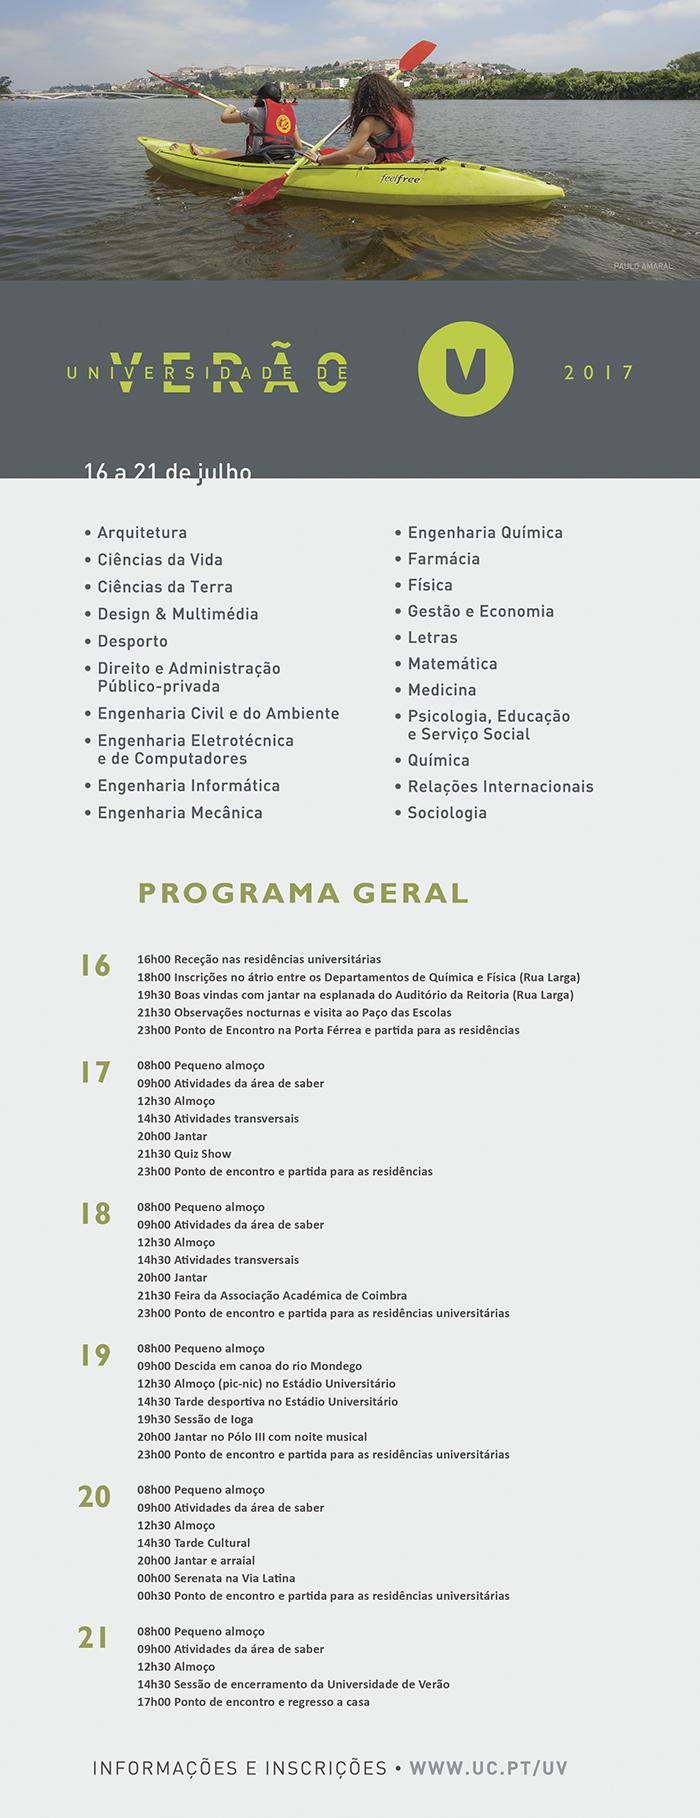 programa_Geral_UV2017